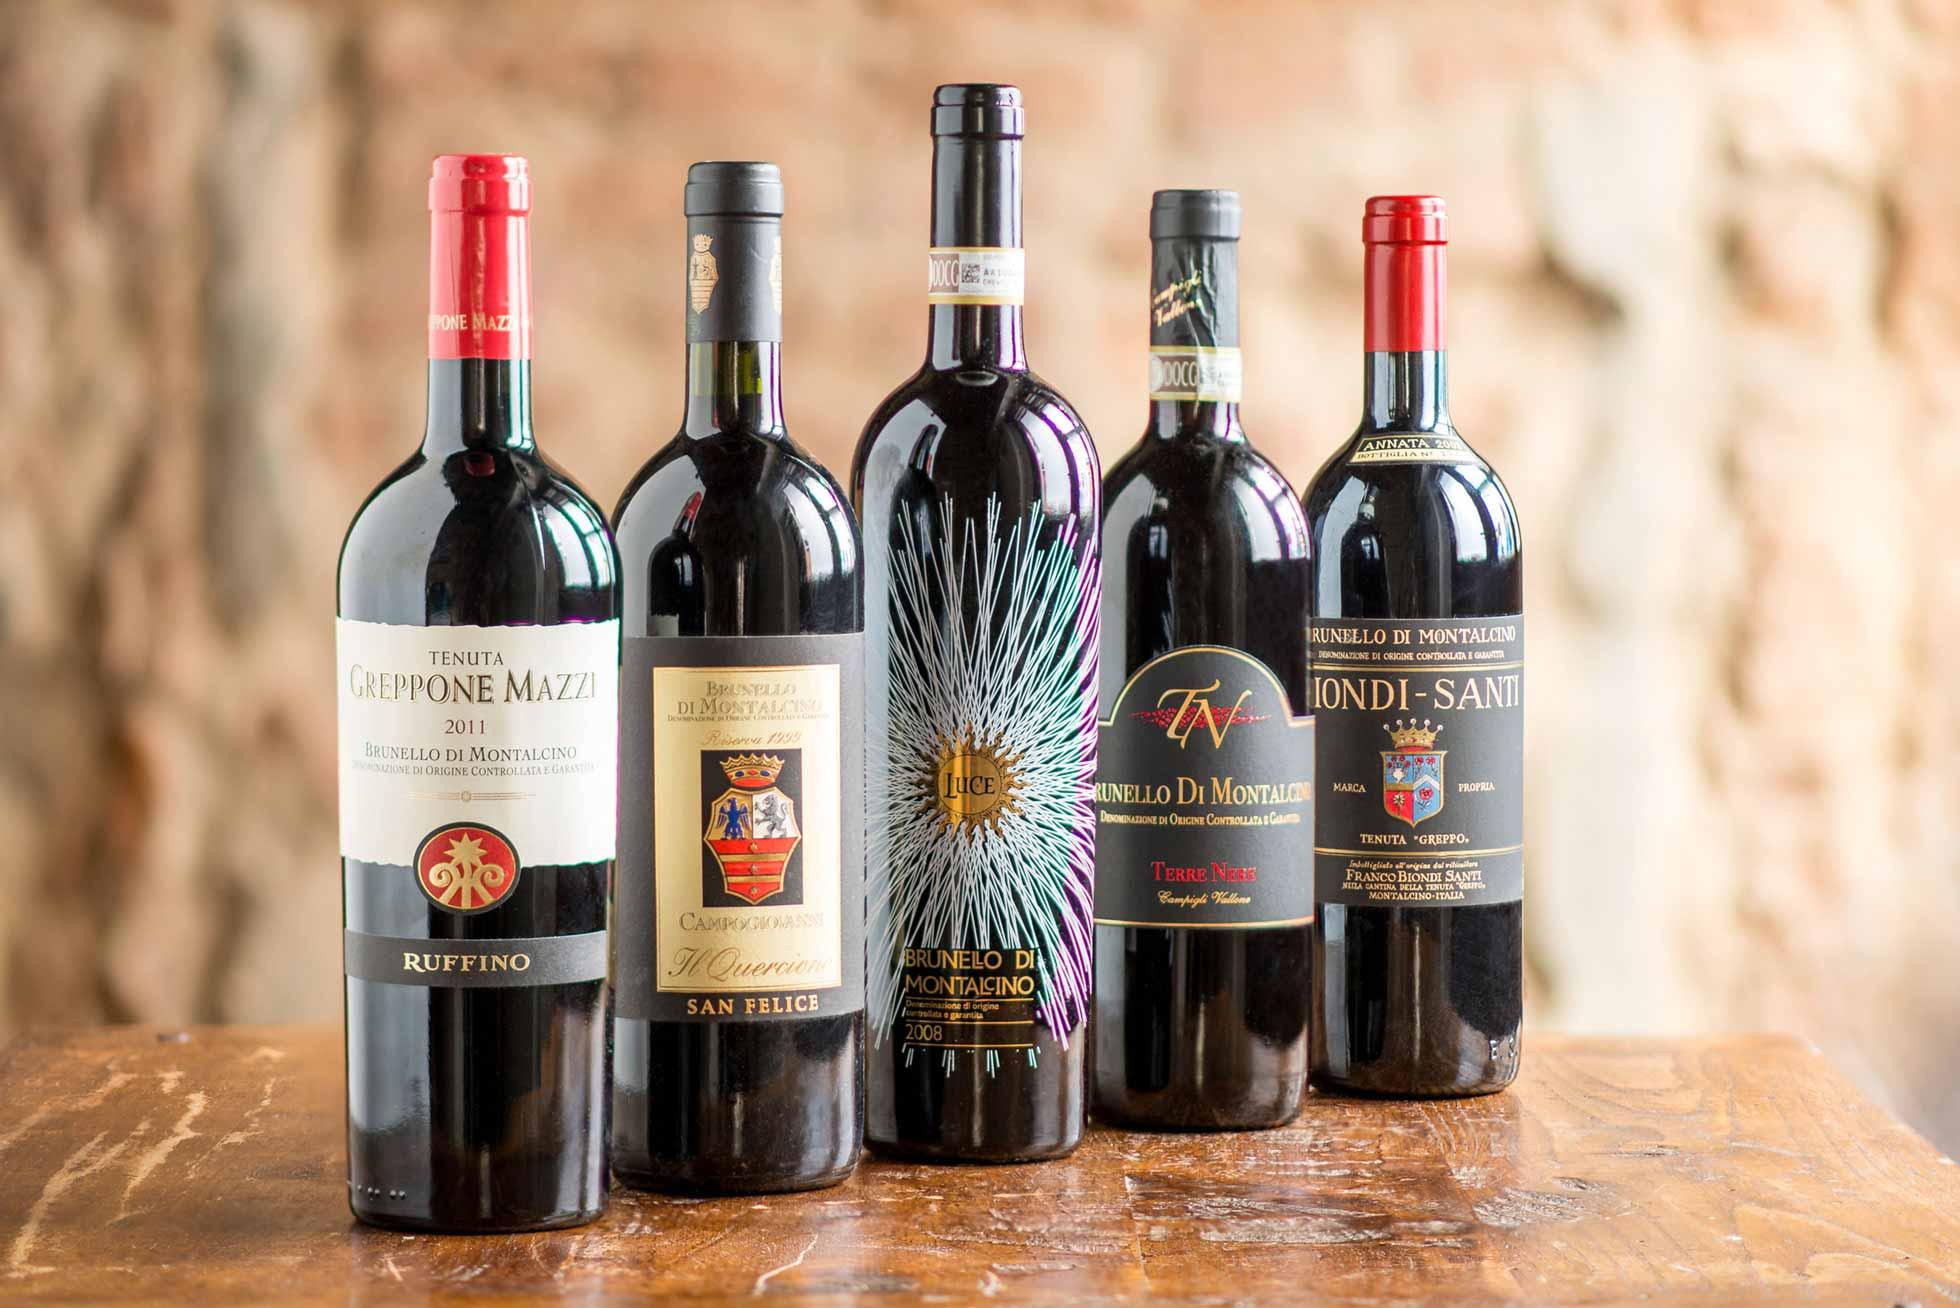 Brunello di Montalcino - Wines - Boccanegra Restaurant Florence Italy